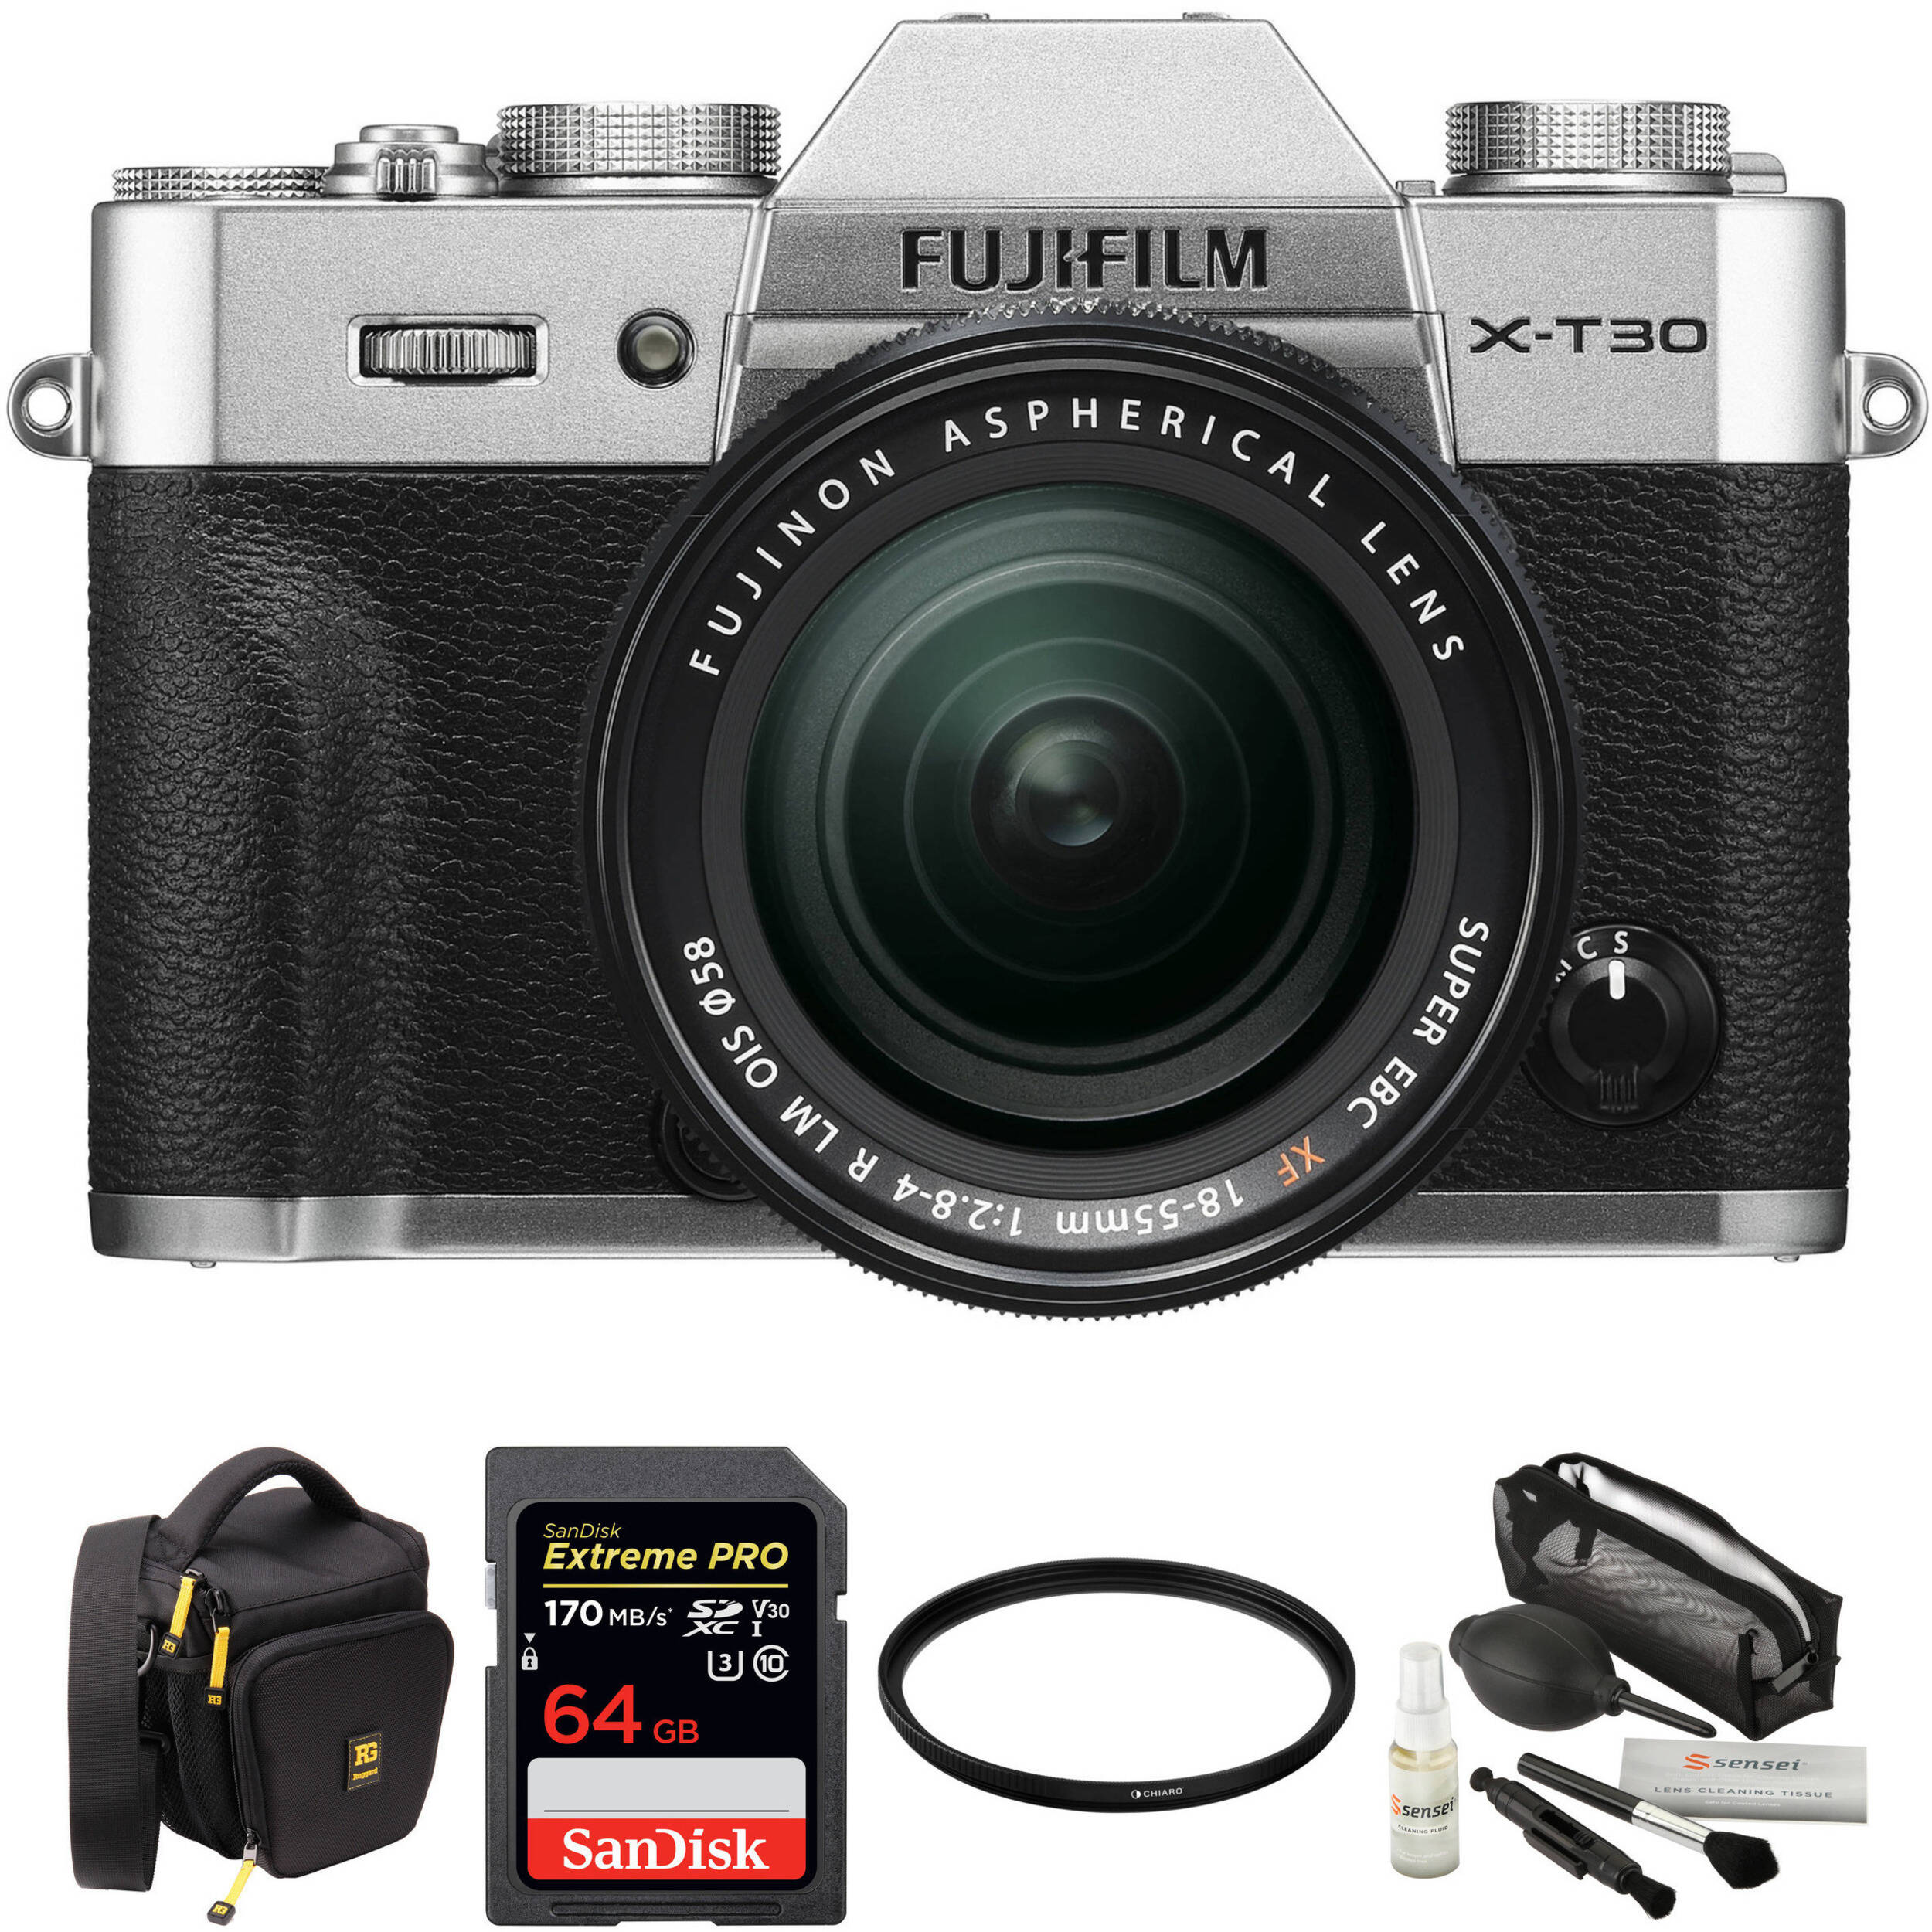 Fuji X Wedding Photography: FUJIFILM X-T30 Mirrorless Digital Camera With 18-55mm Lens And